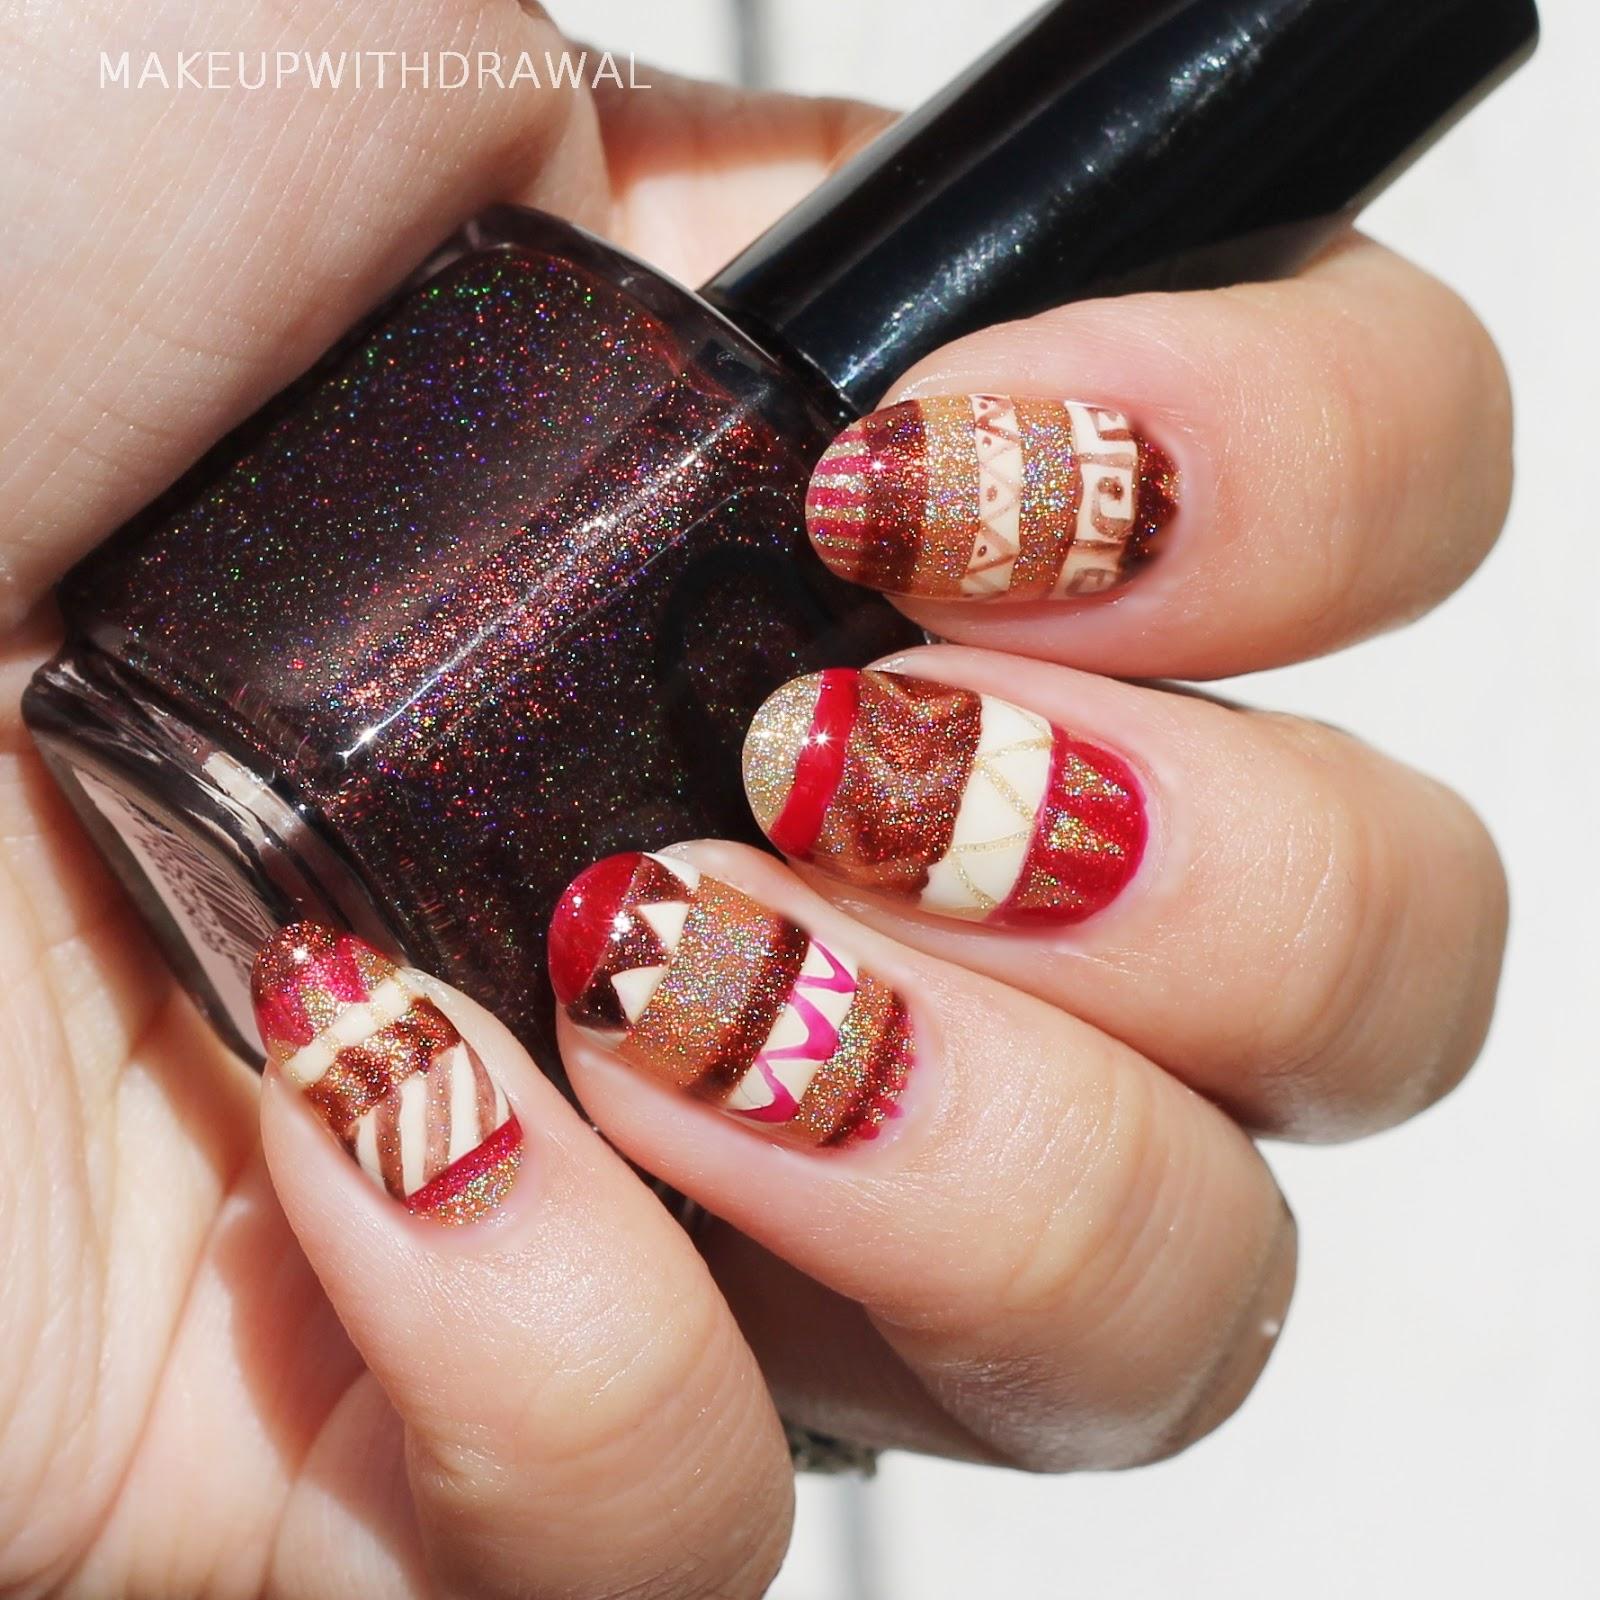 Glitter Gal Pysanky Nails | Makeup Withdrawal